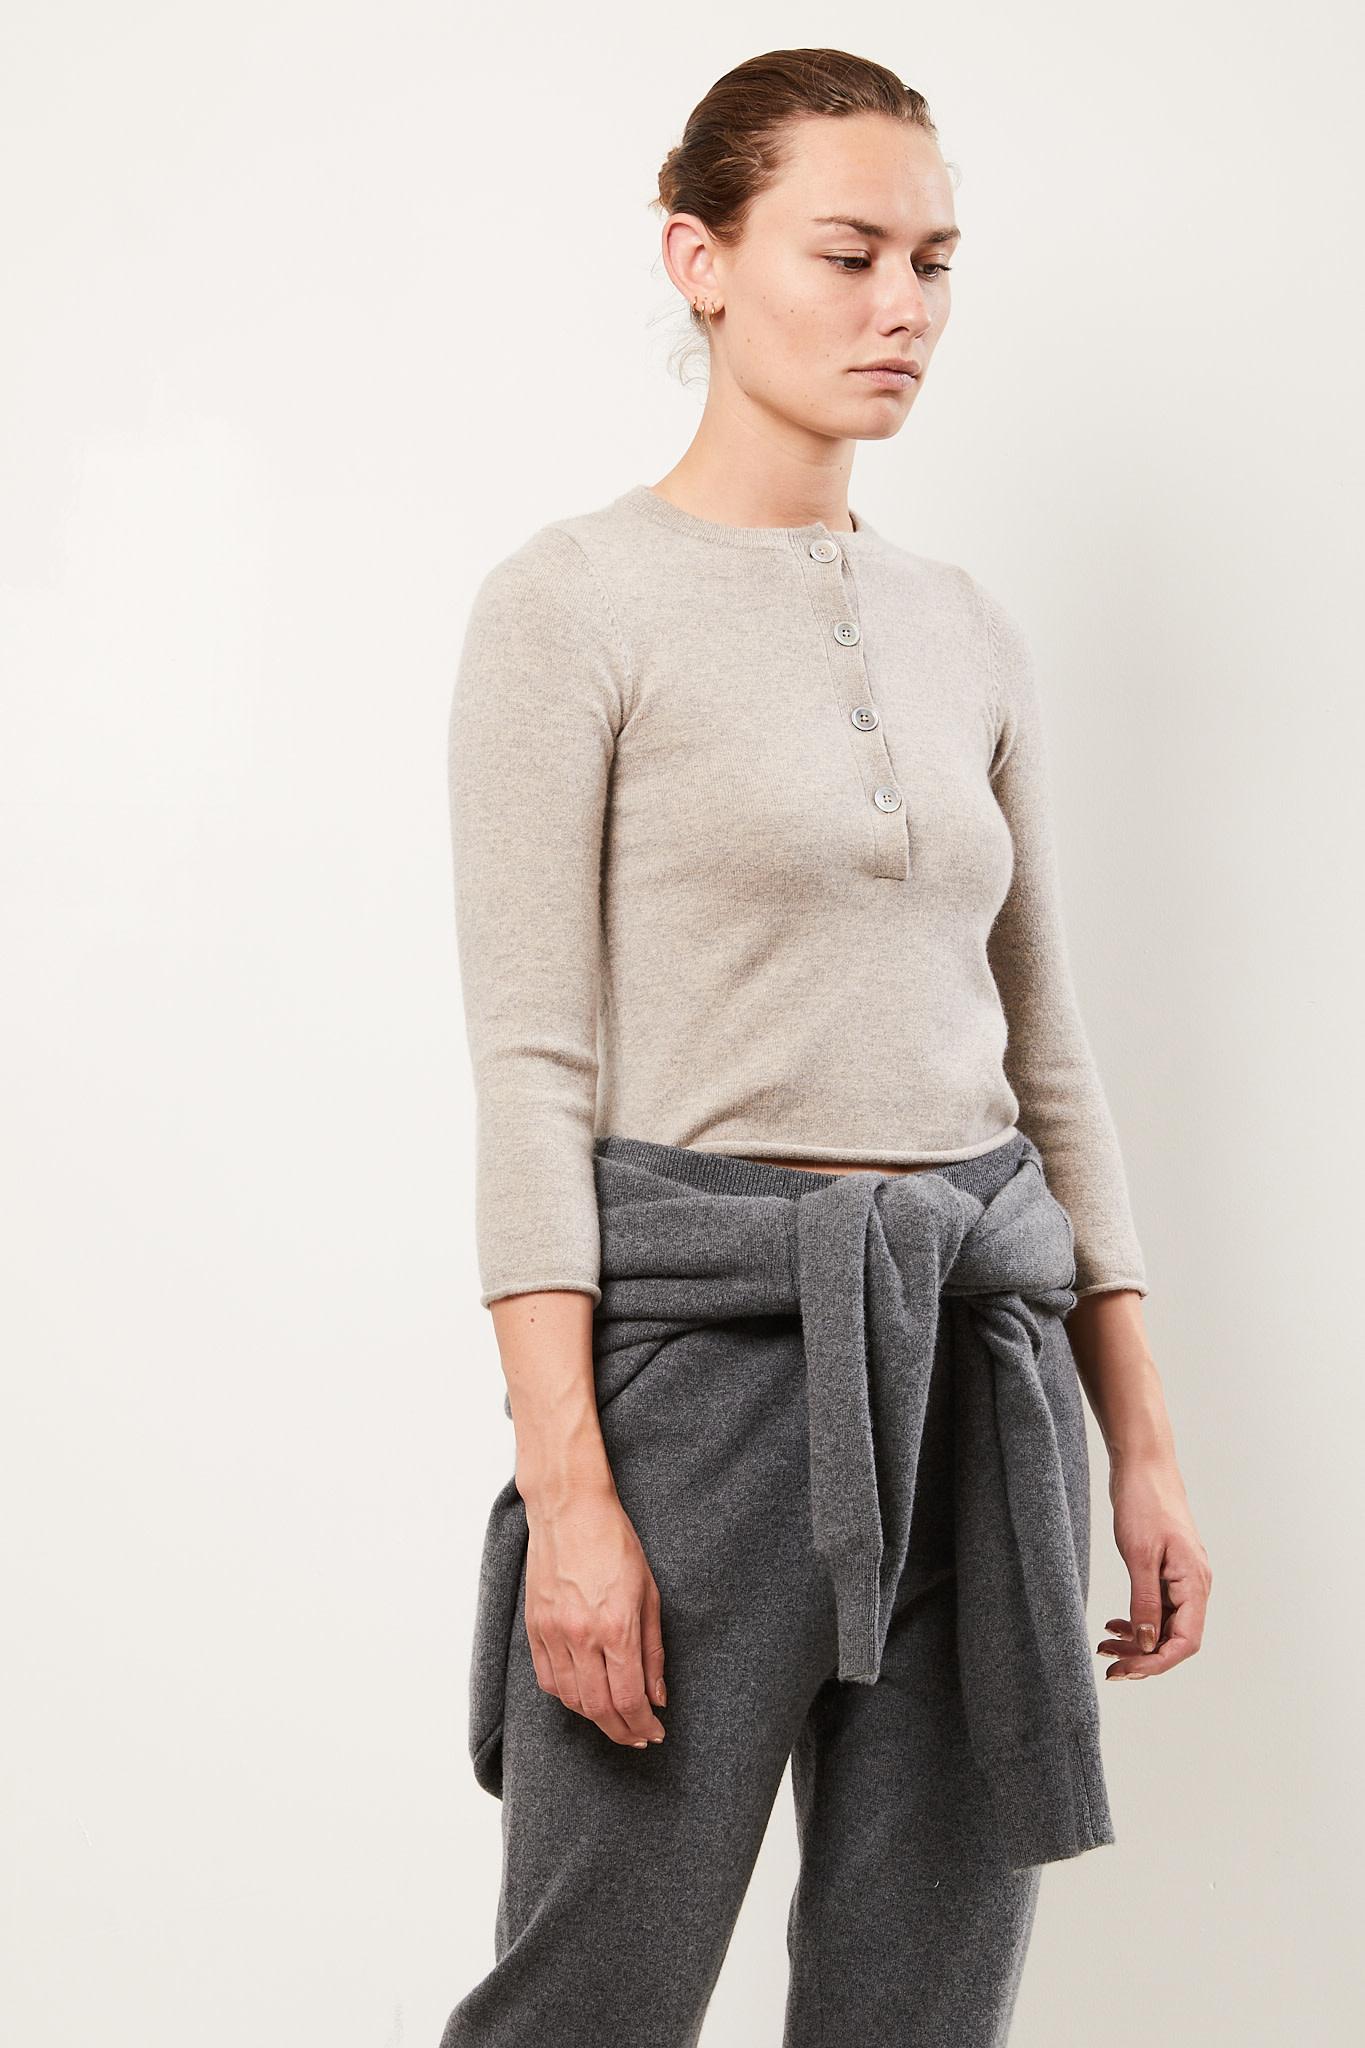 extreme cashmere - Ema shrunken fit sweater